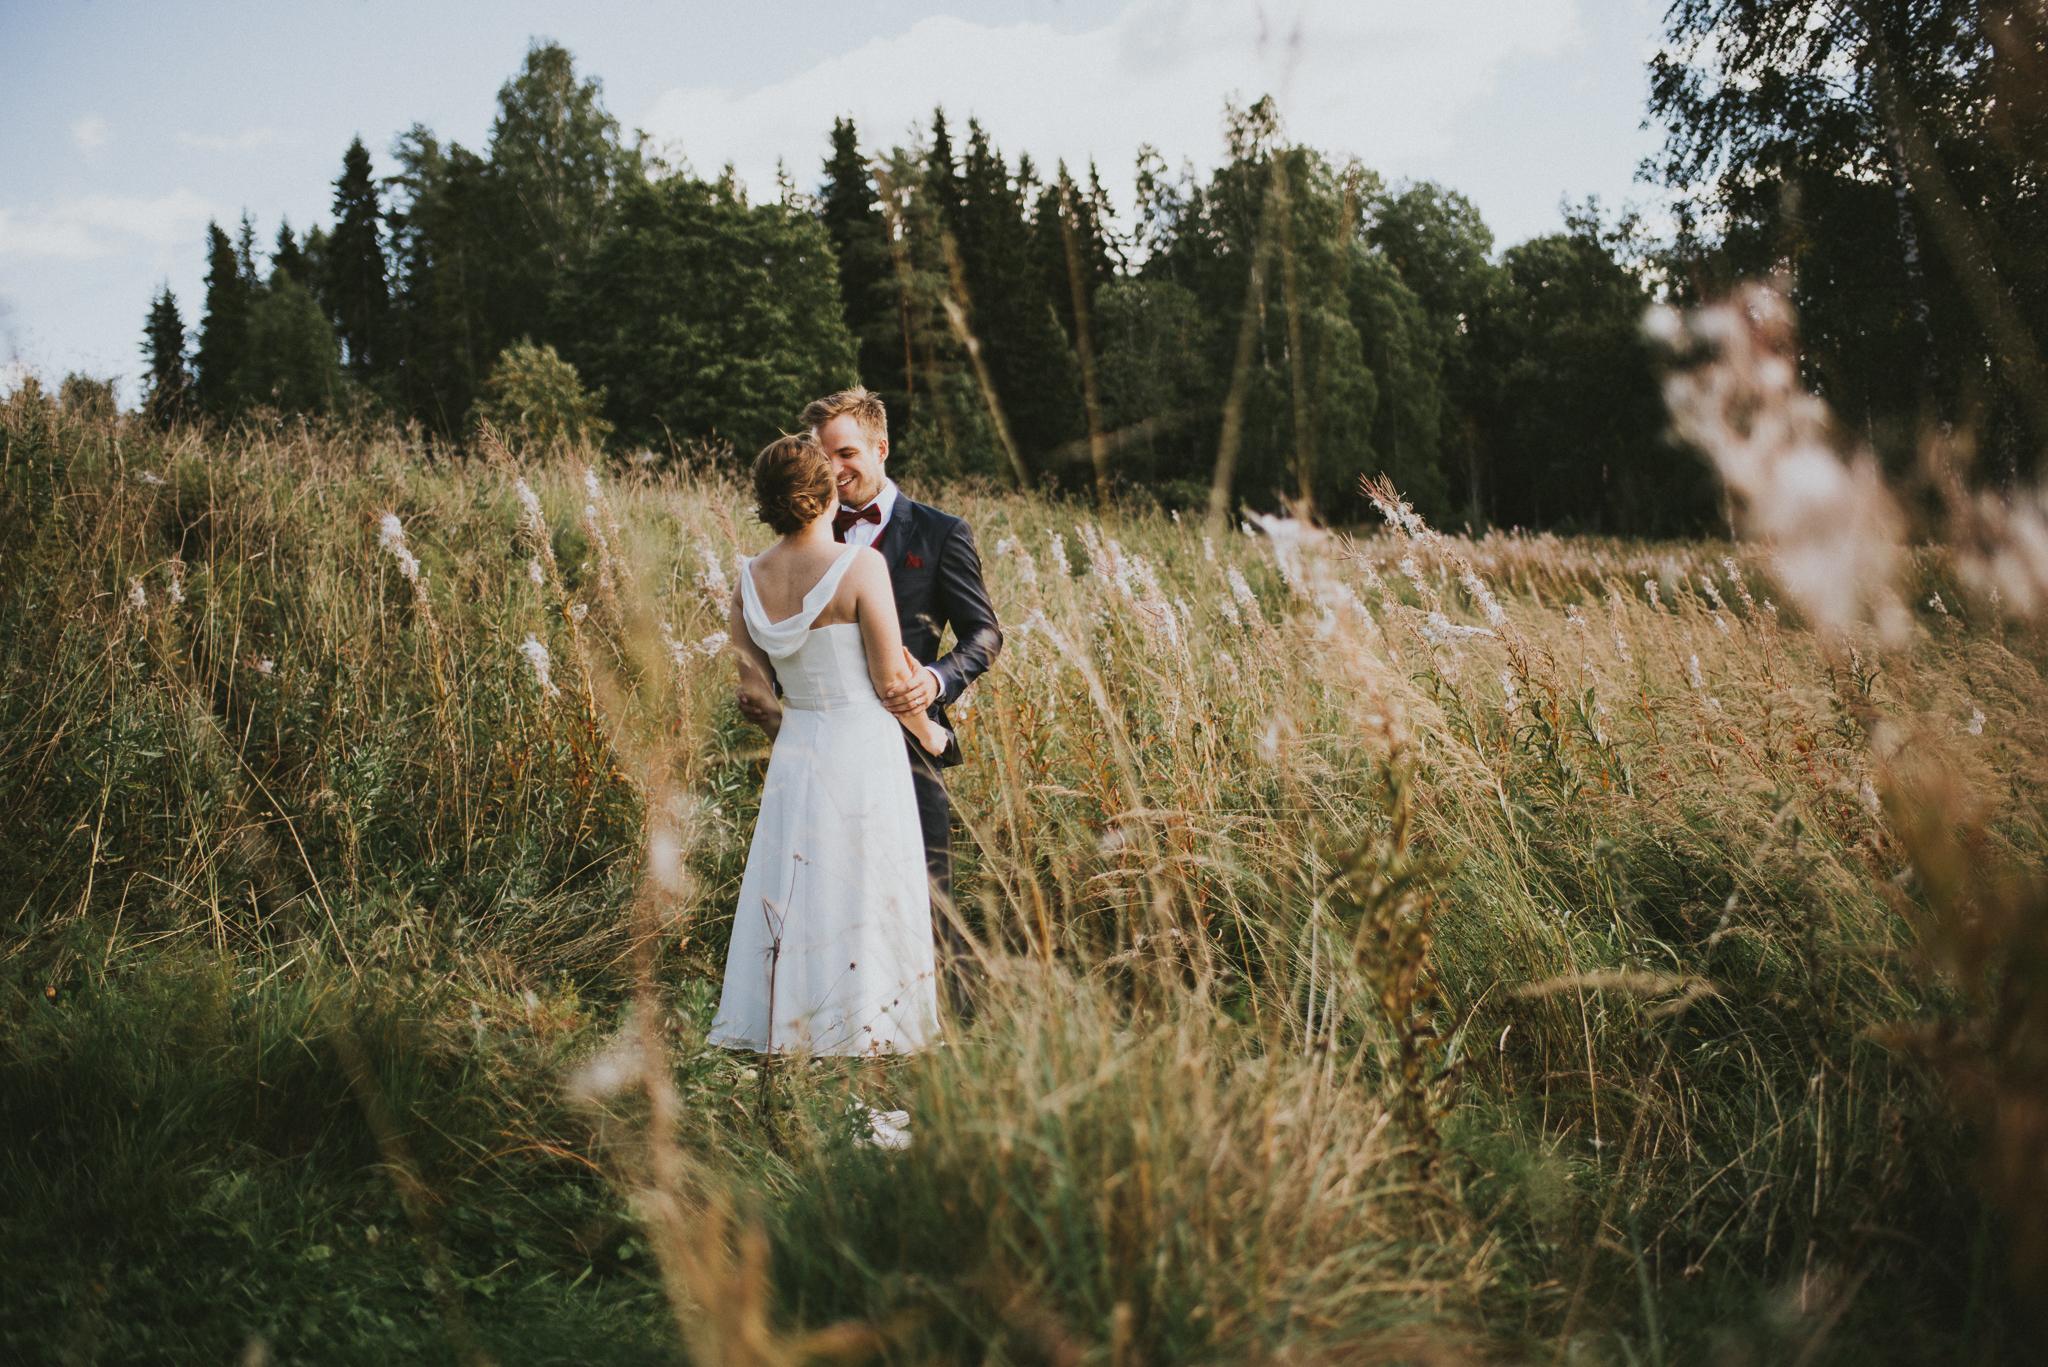 55-stjarnsund-sweden-wedding-martarobin-web-4072.jpg